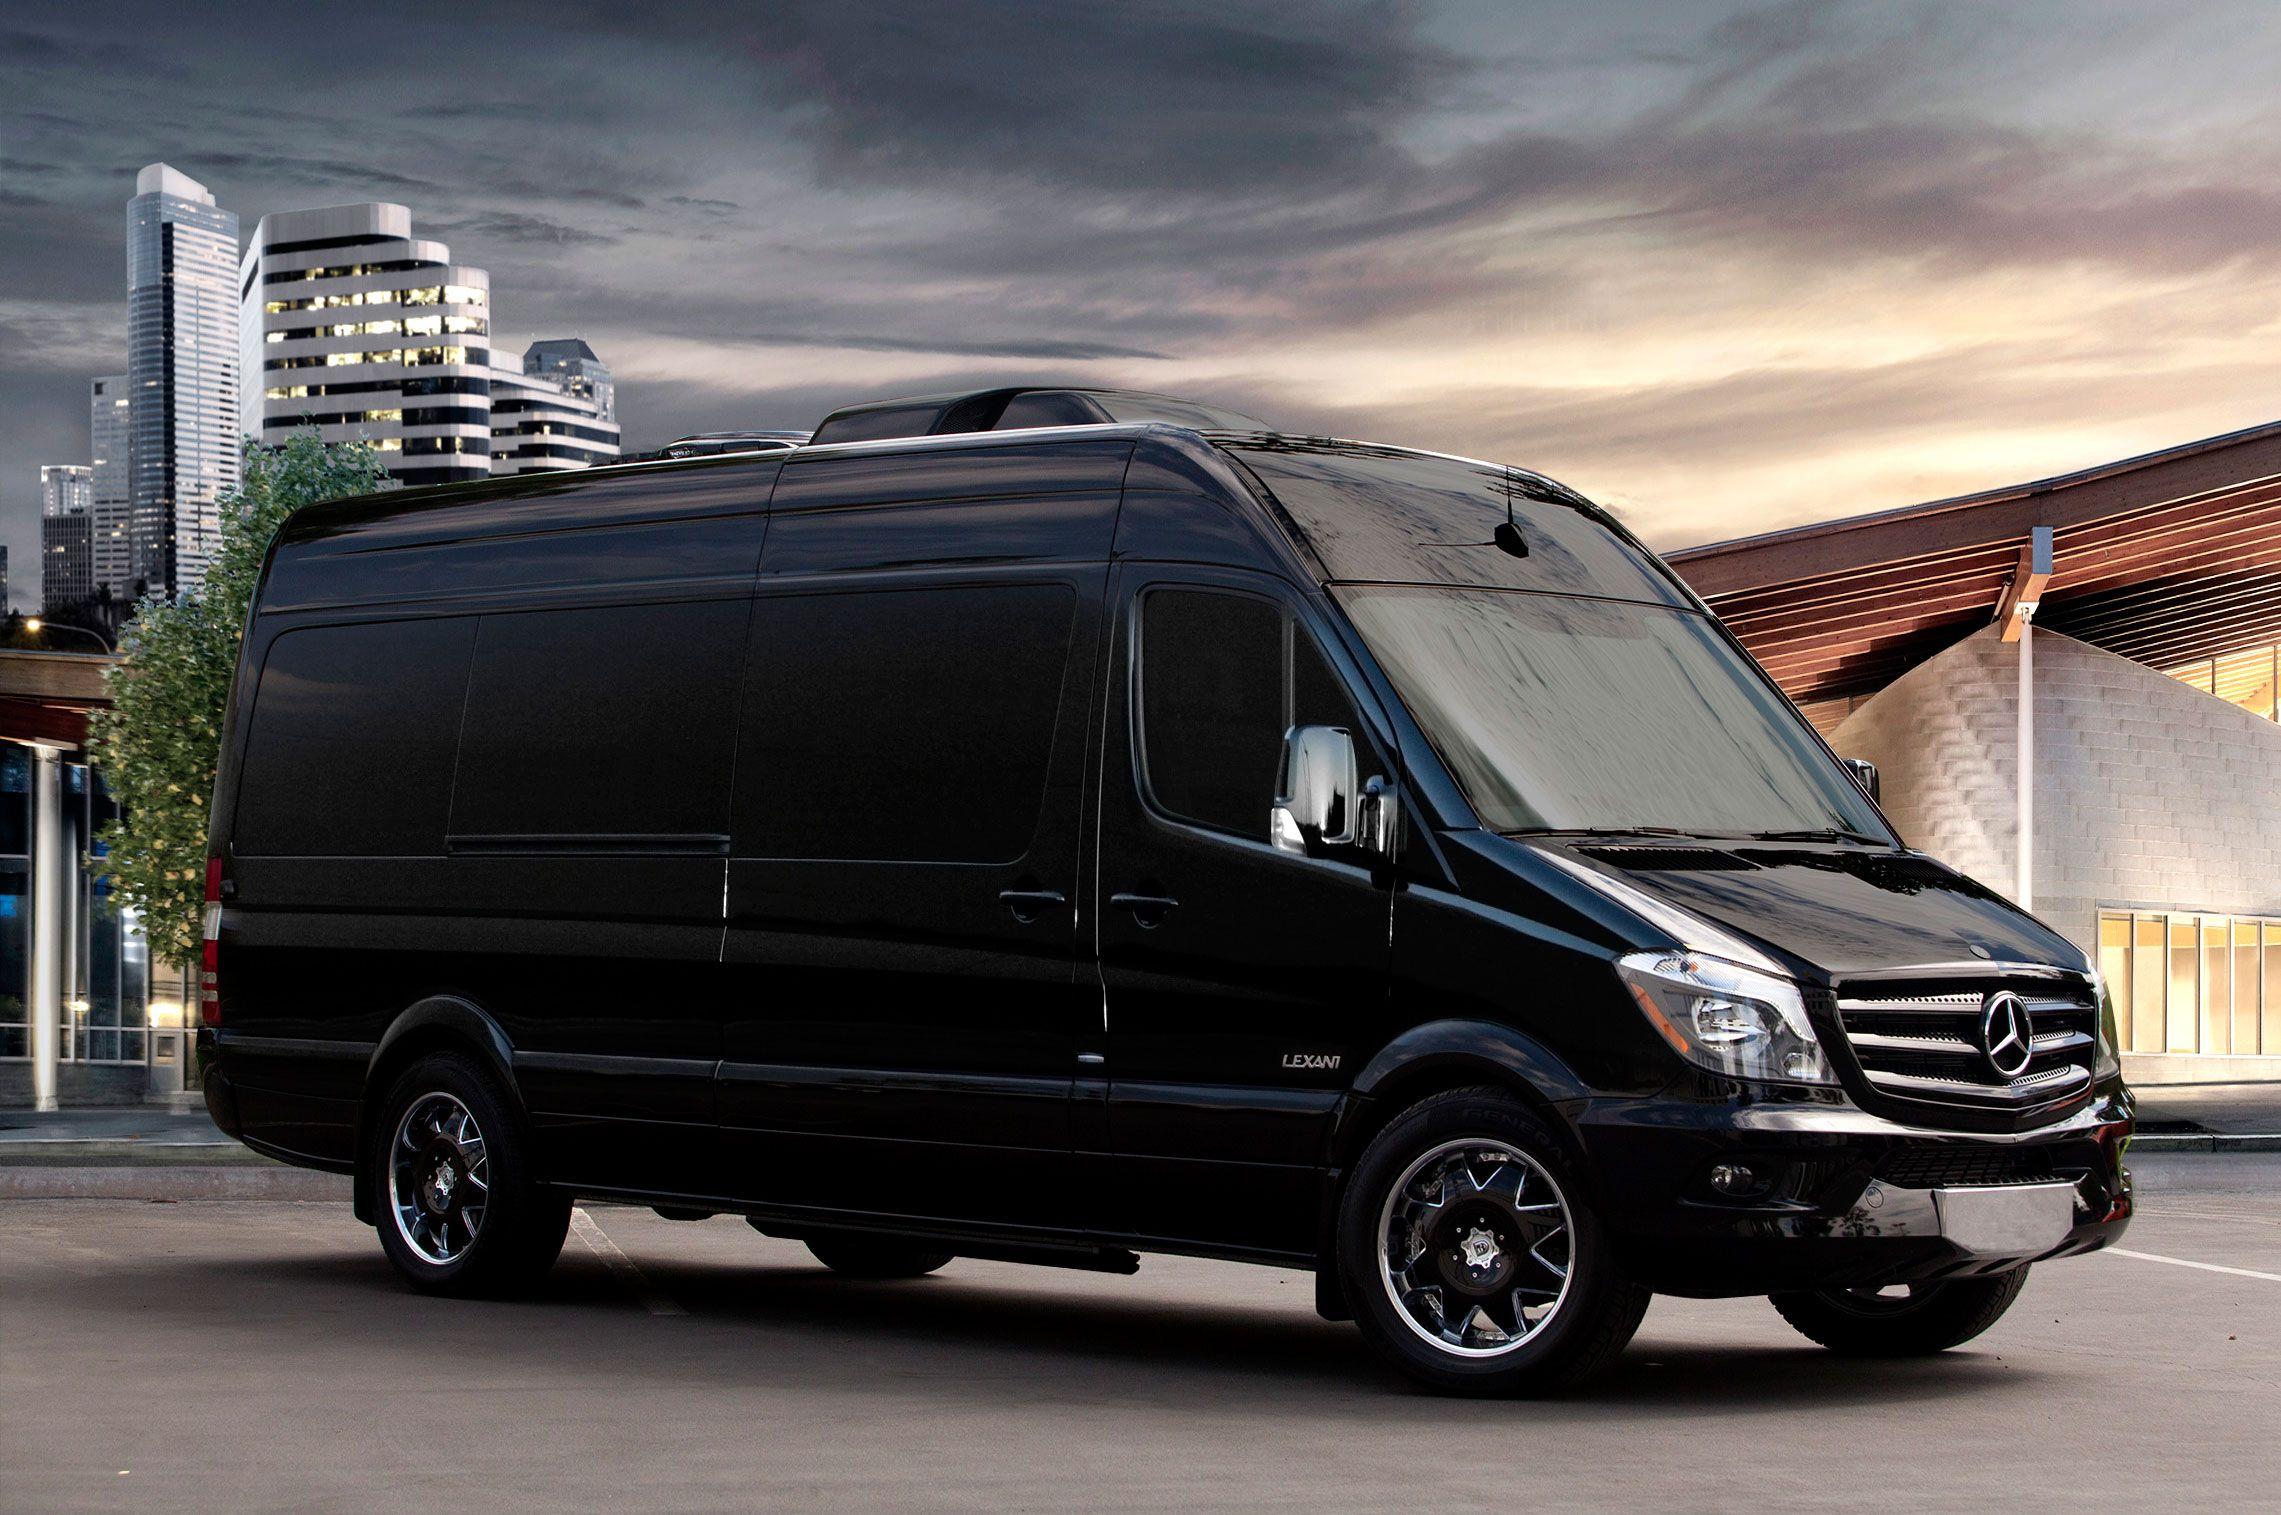 2017 mercedes sprinter benz van luxury van limo limousine limo service